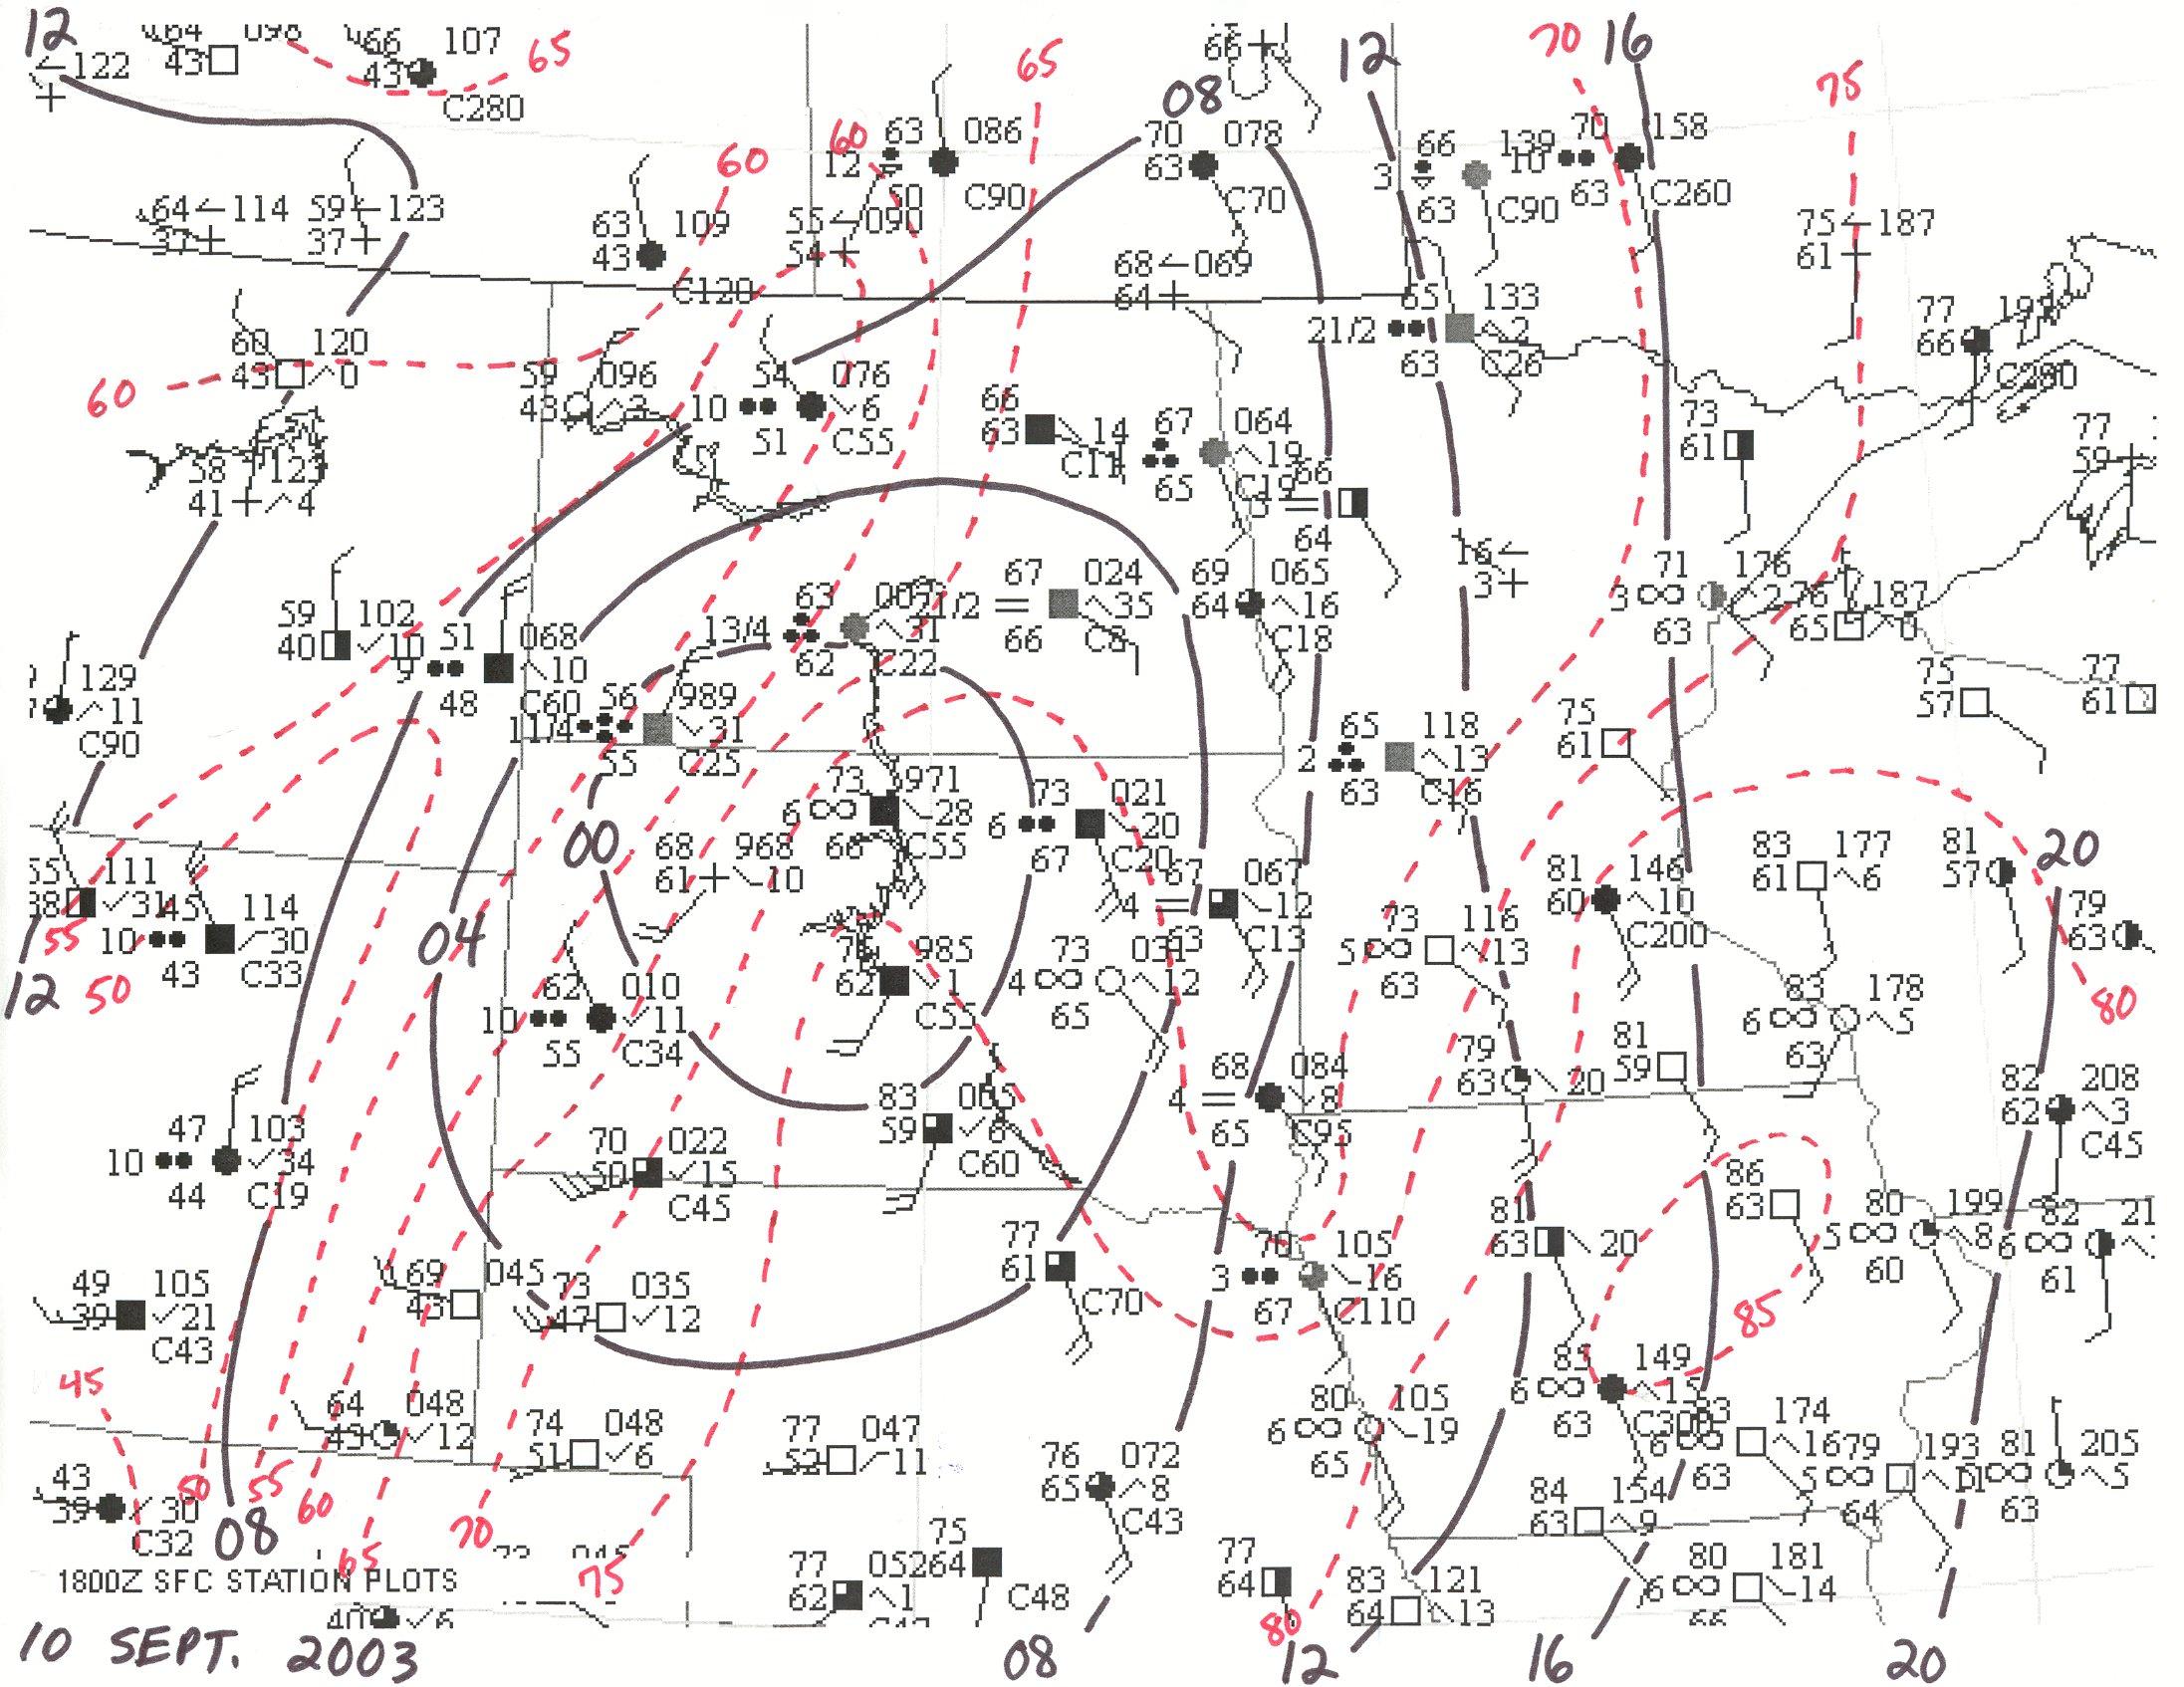 Surface Weatherysis